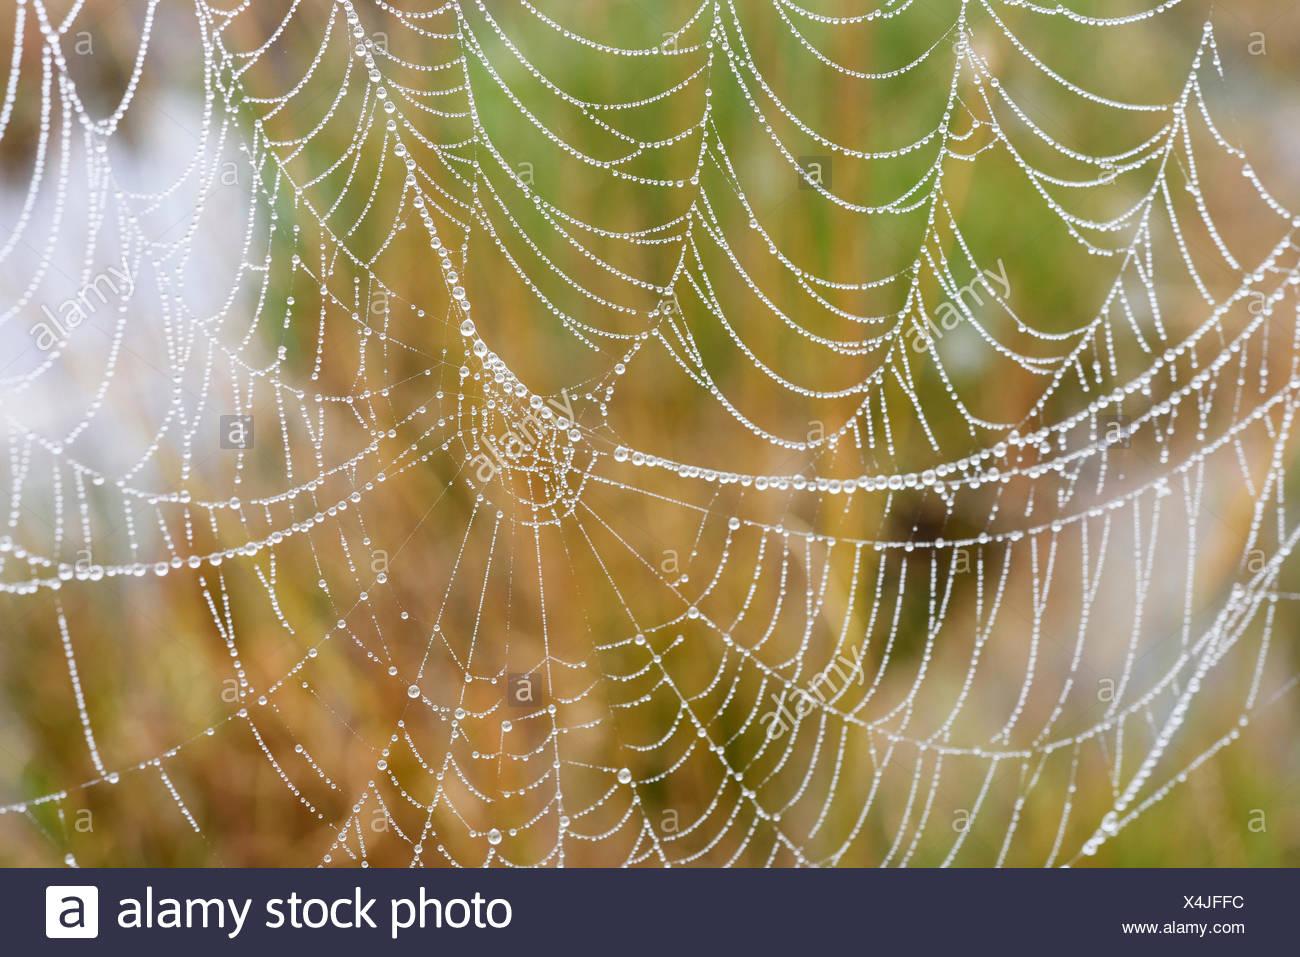 Orb web of a Garden Cross Spider (Araneus diadematus) with dew drops, Bavaria, Germany - Stock Image